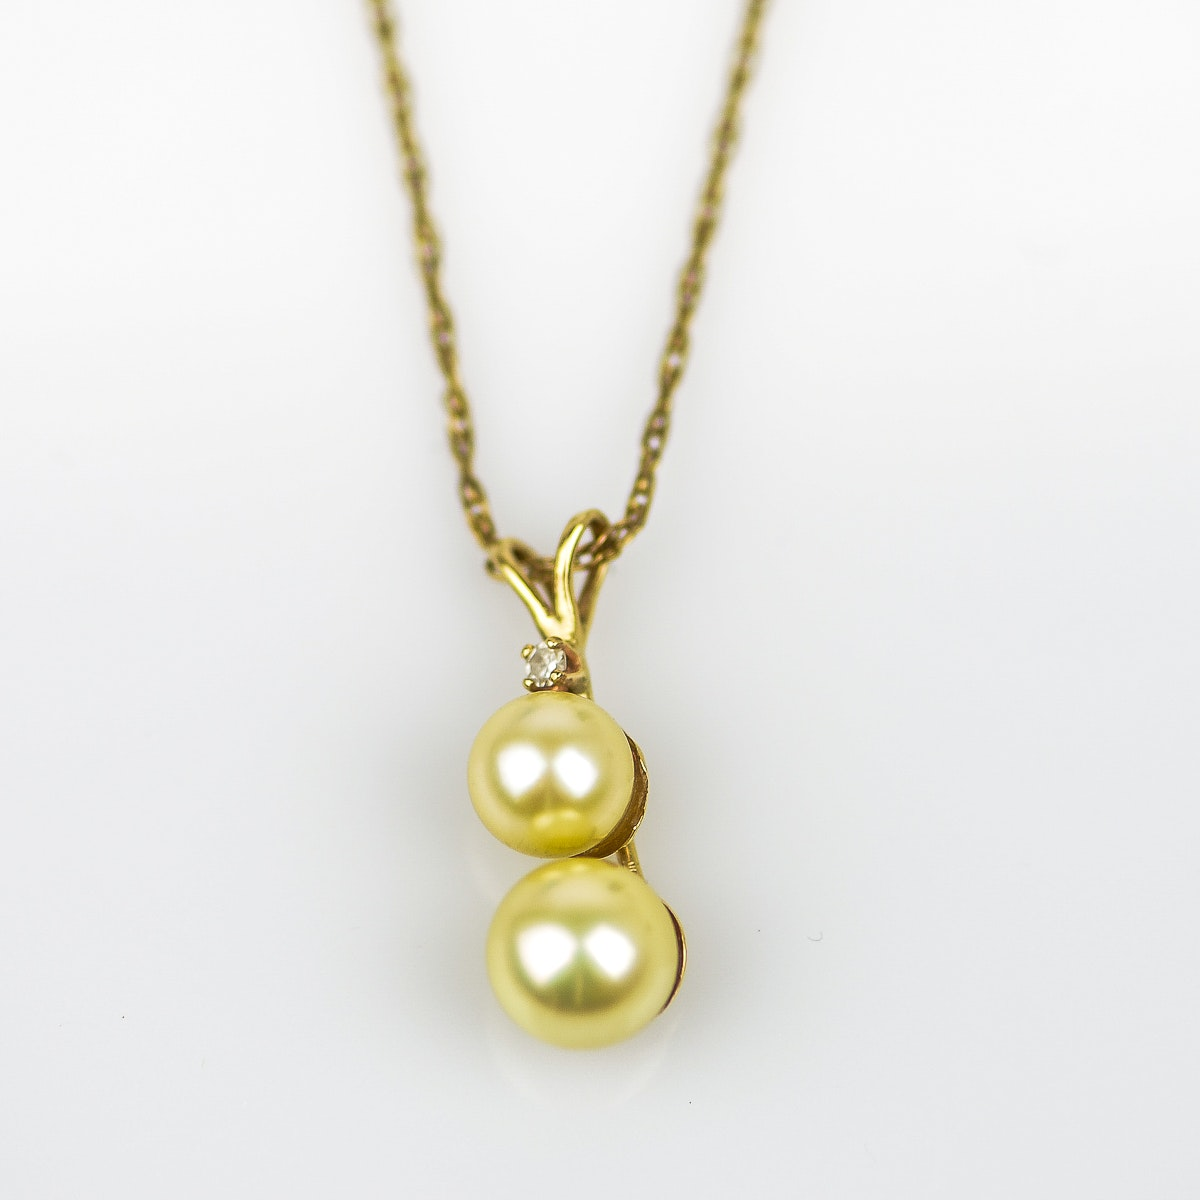 14K Gold, Pearl, and Diamond Pendant